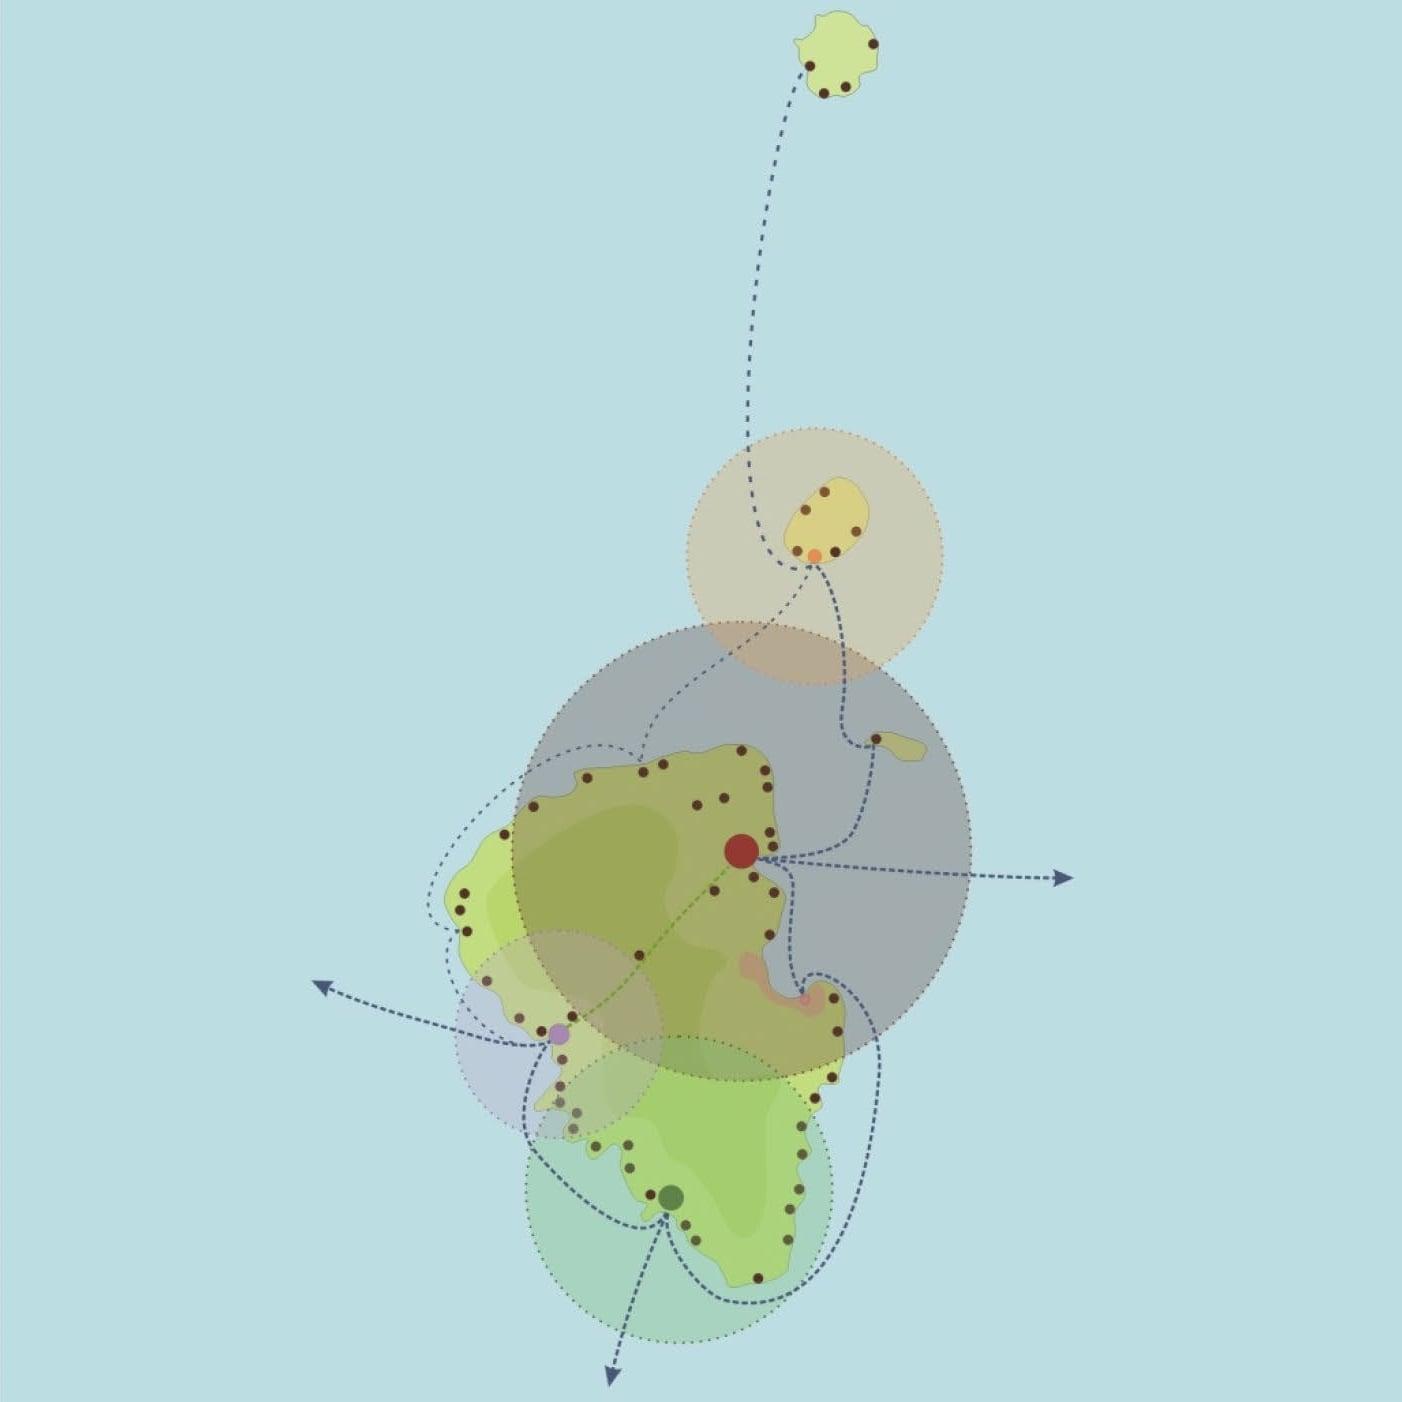 Lihir Island Group Strategy